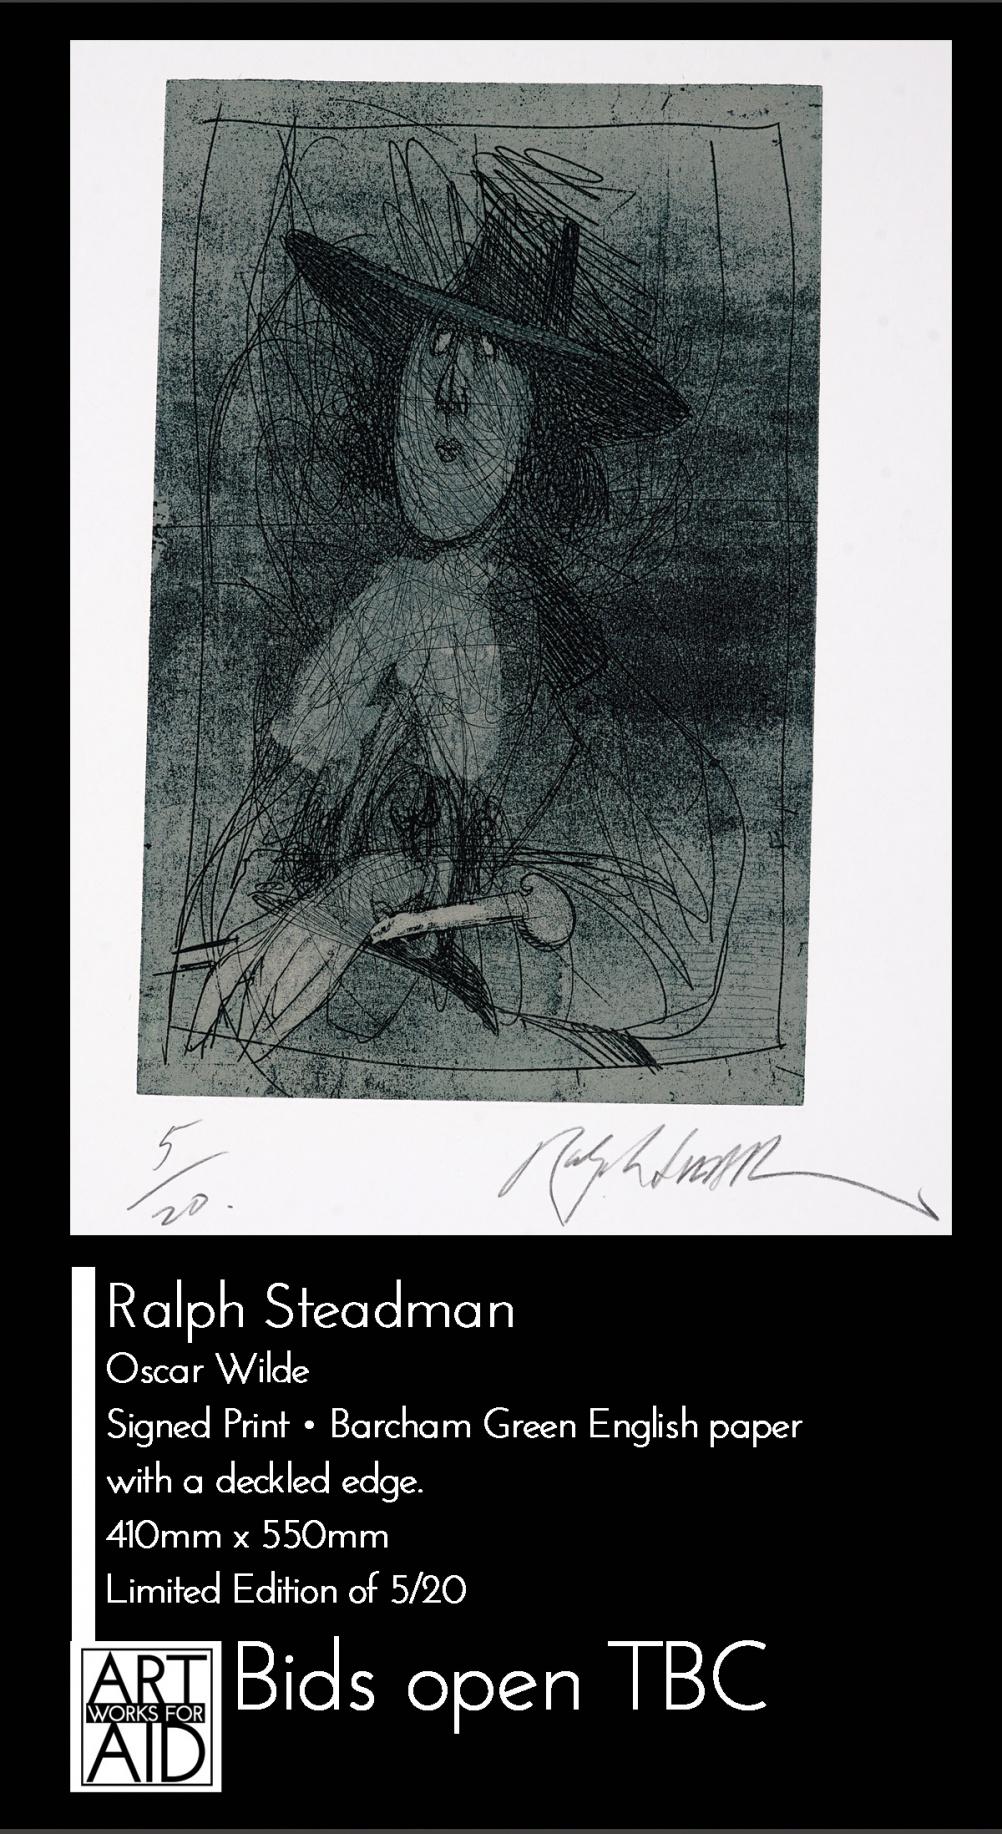 © Ralph Steadman - Oscar Wilde